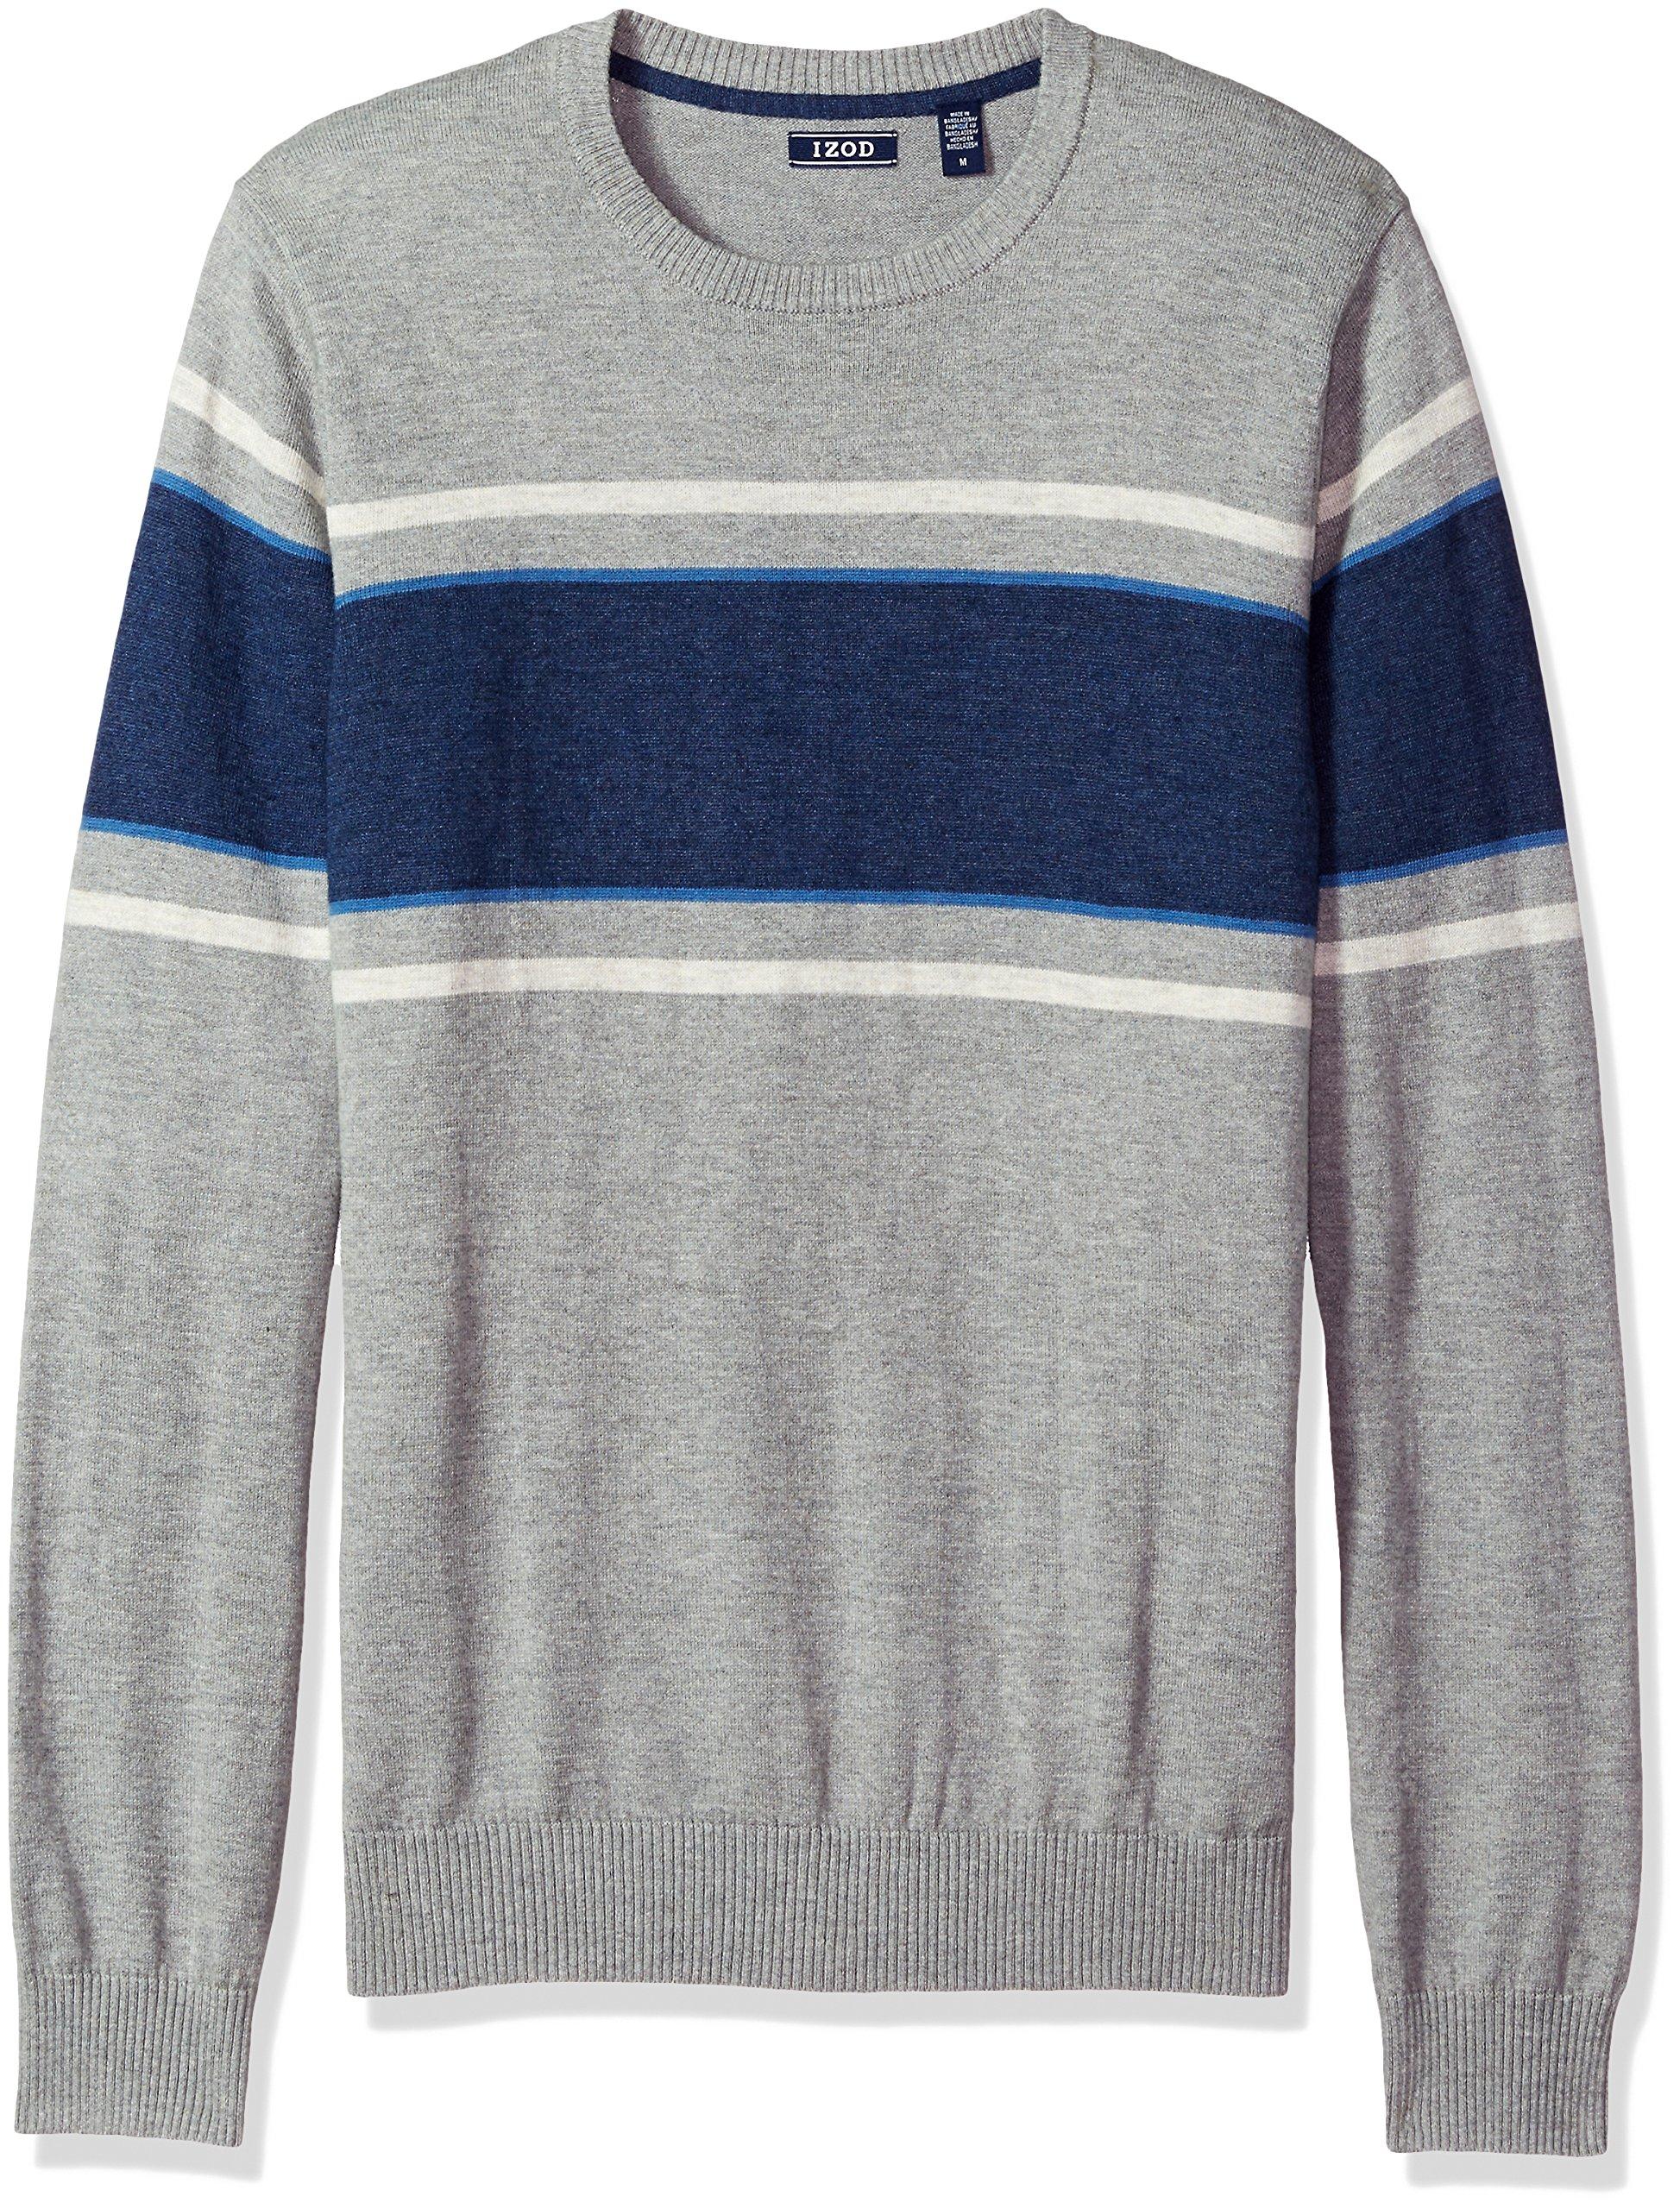 IZOD Men's Fine Gauge Crew Sweater, Light Gray Heather, Large